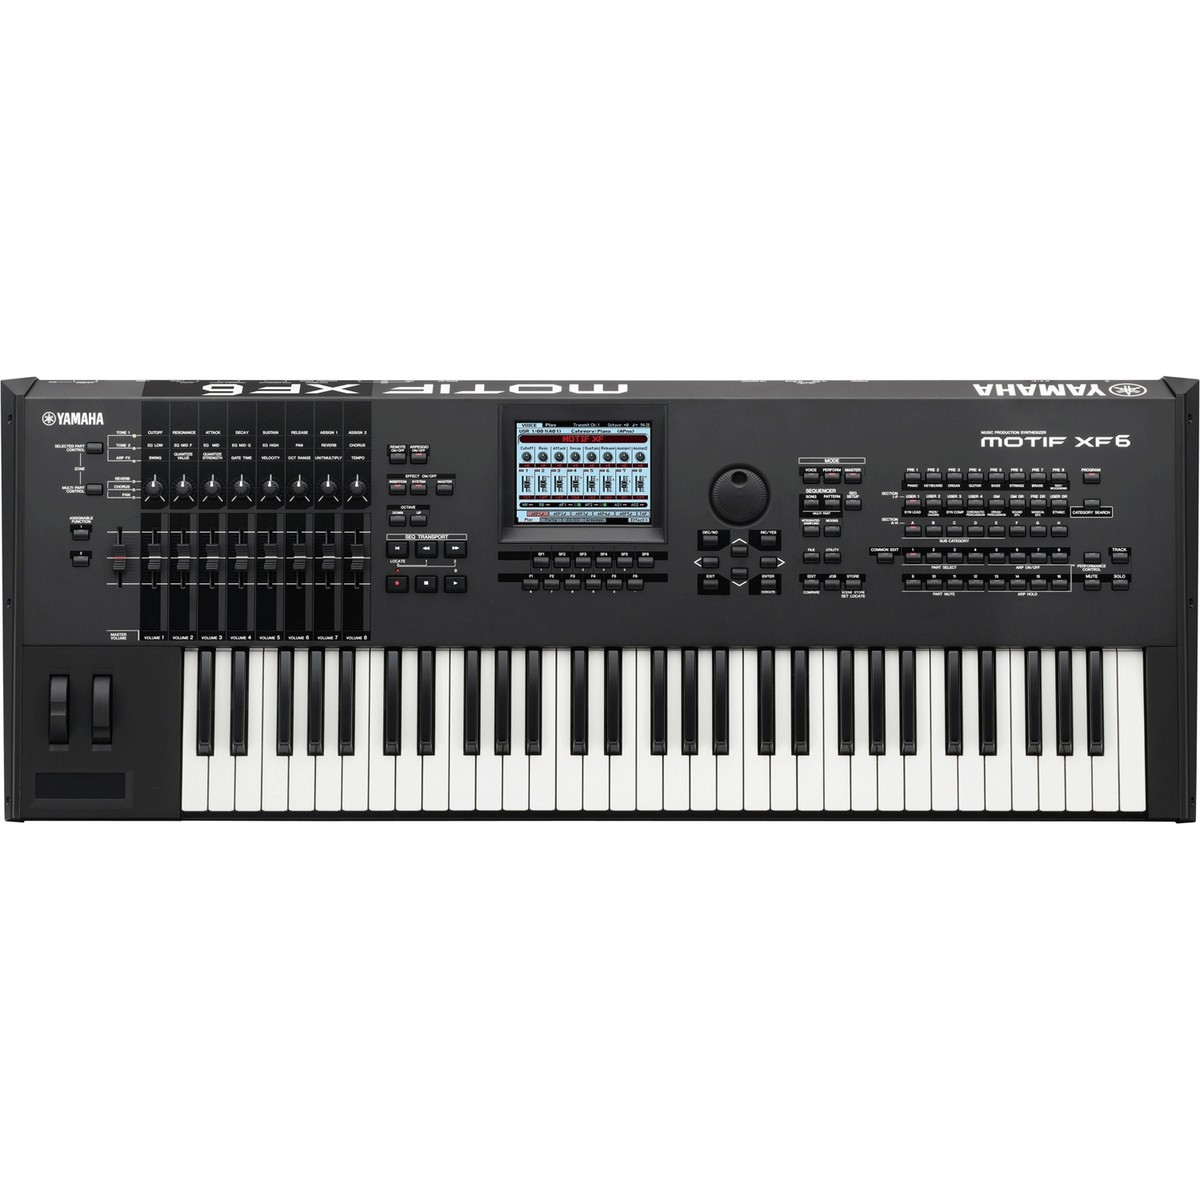 Keyboard Workstation Yamaha : yamaha motif xf6 keyboard workstation b stock at ~ Russianpoet.info Haus und Dekorationen